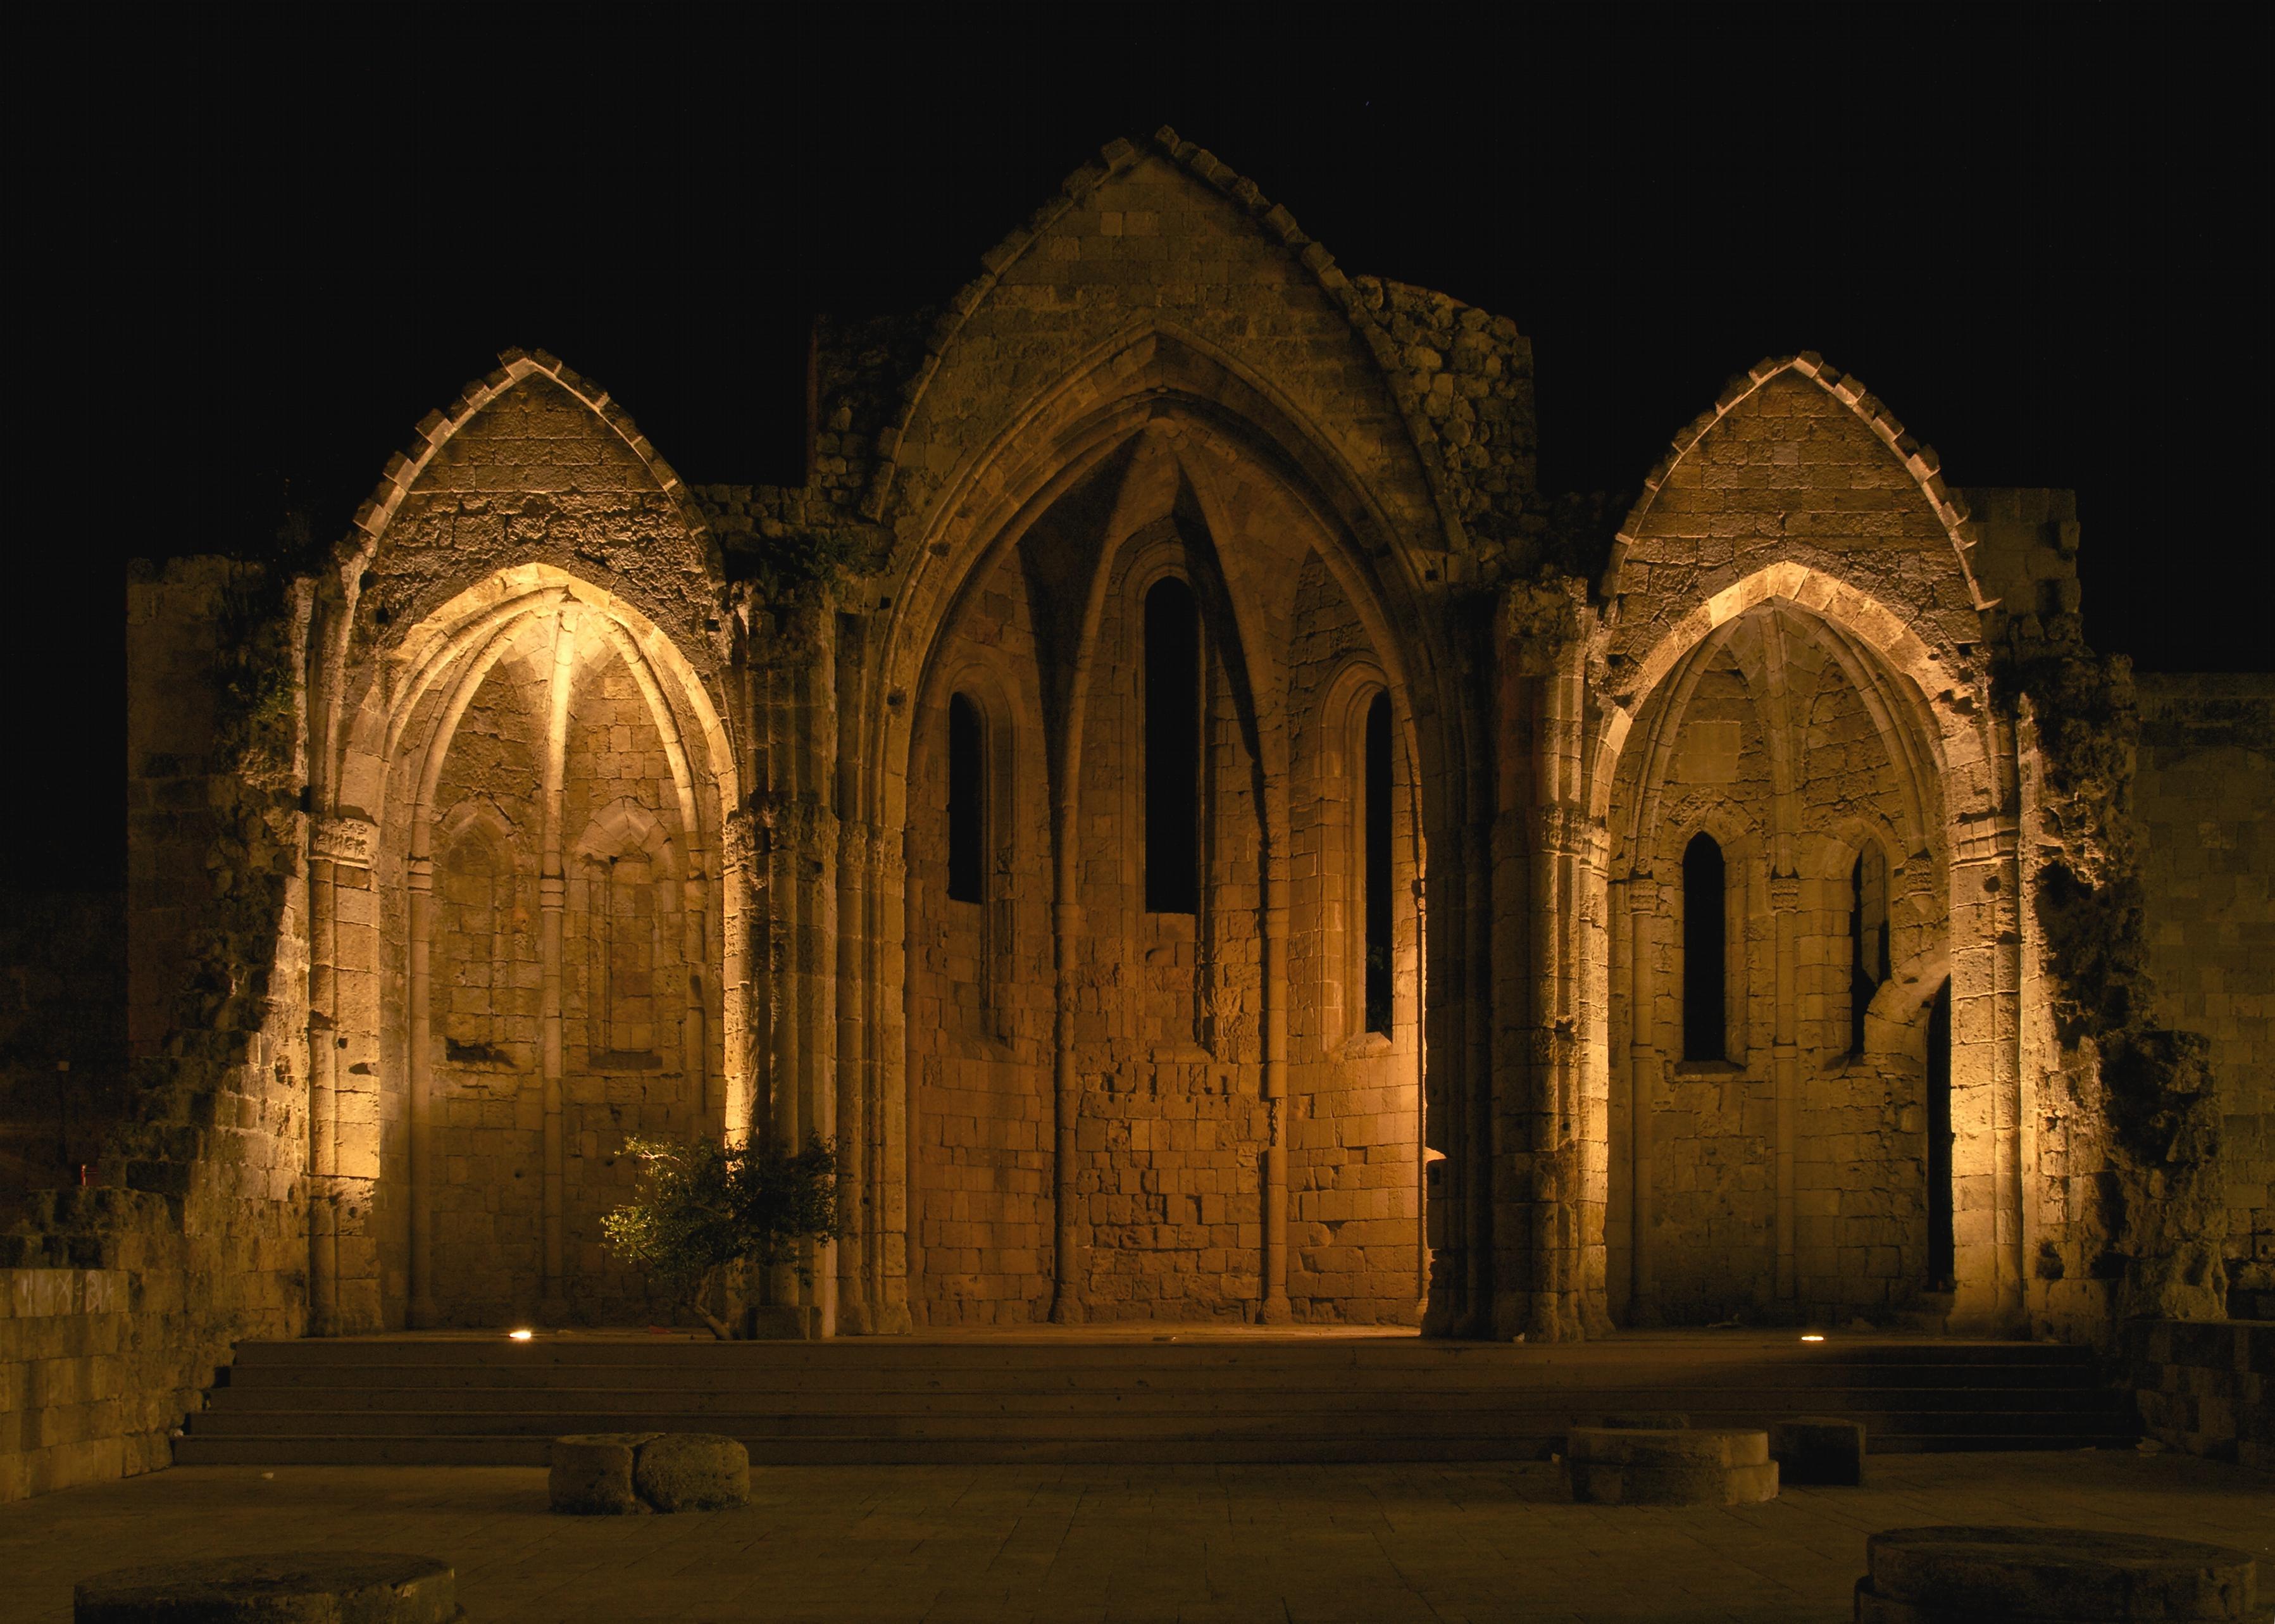 Church of the virgin of the burgh Rhodes 14th century night.jpg